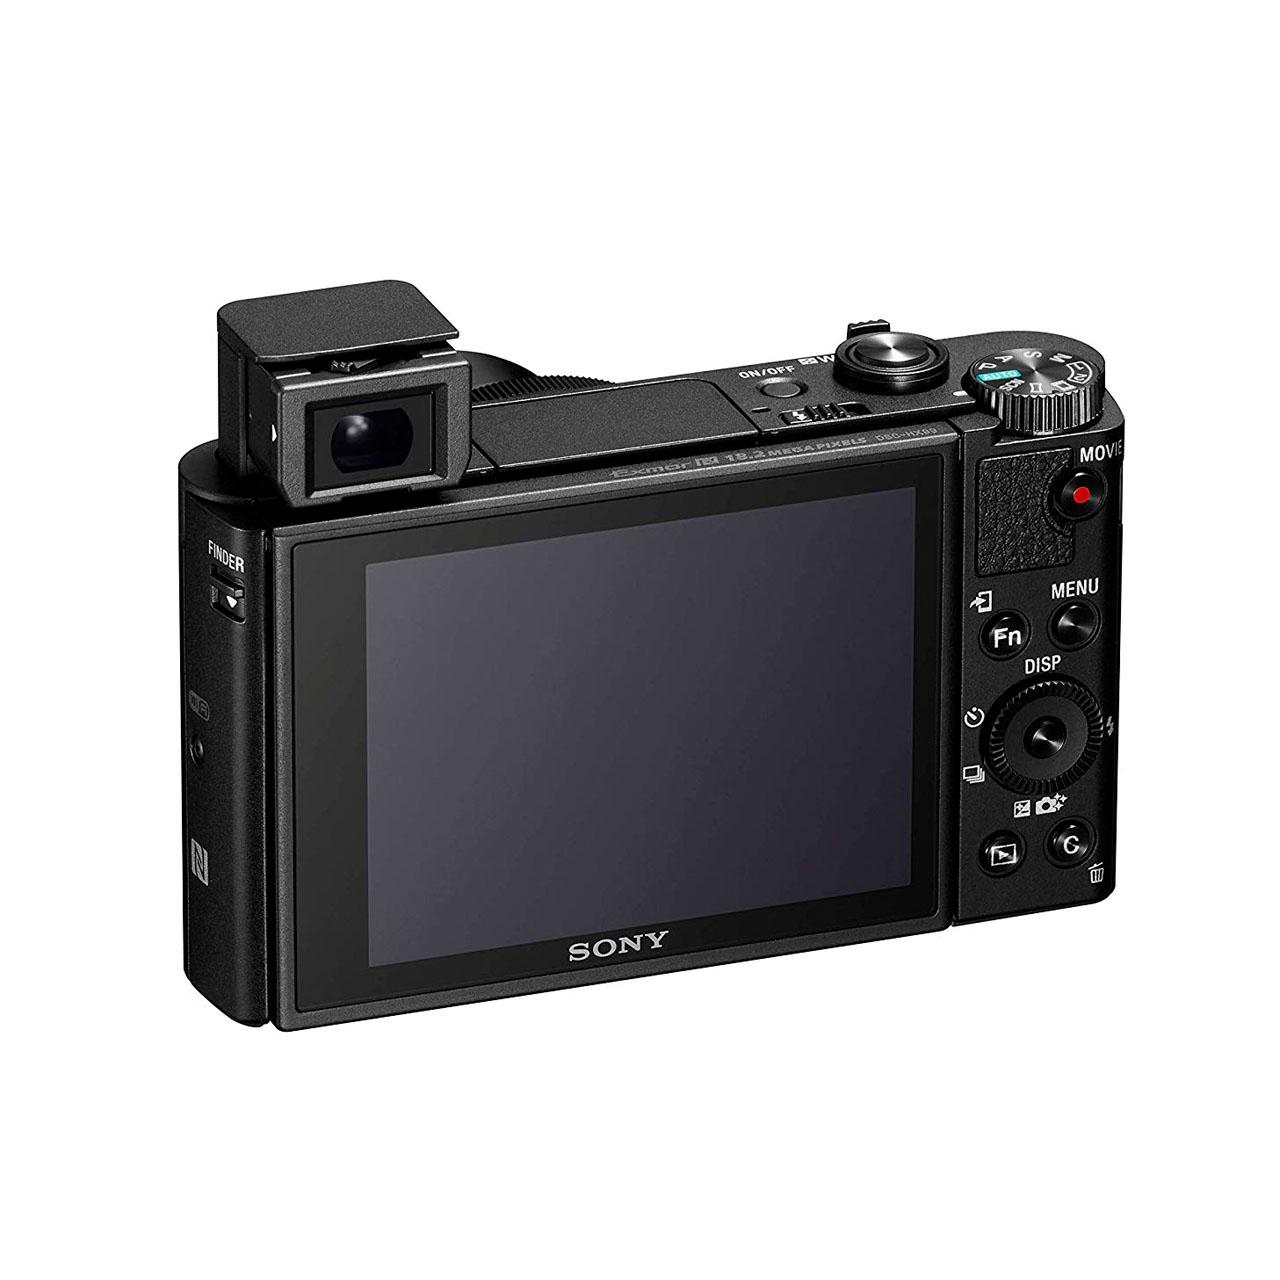 Sony Cámara Compacta DSC-HX99 Negra + Objetivo Zeiss 24-720 mm